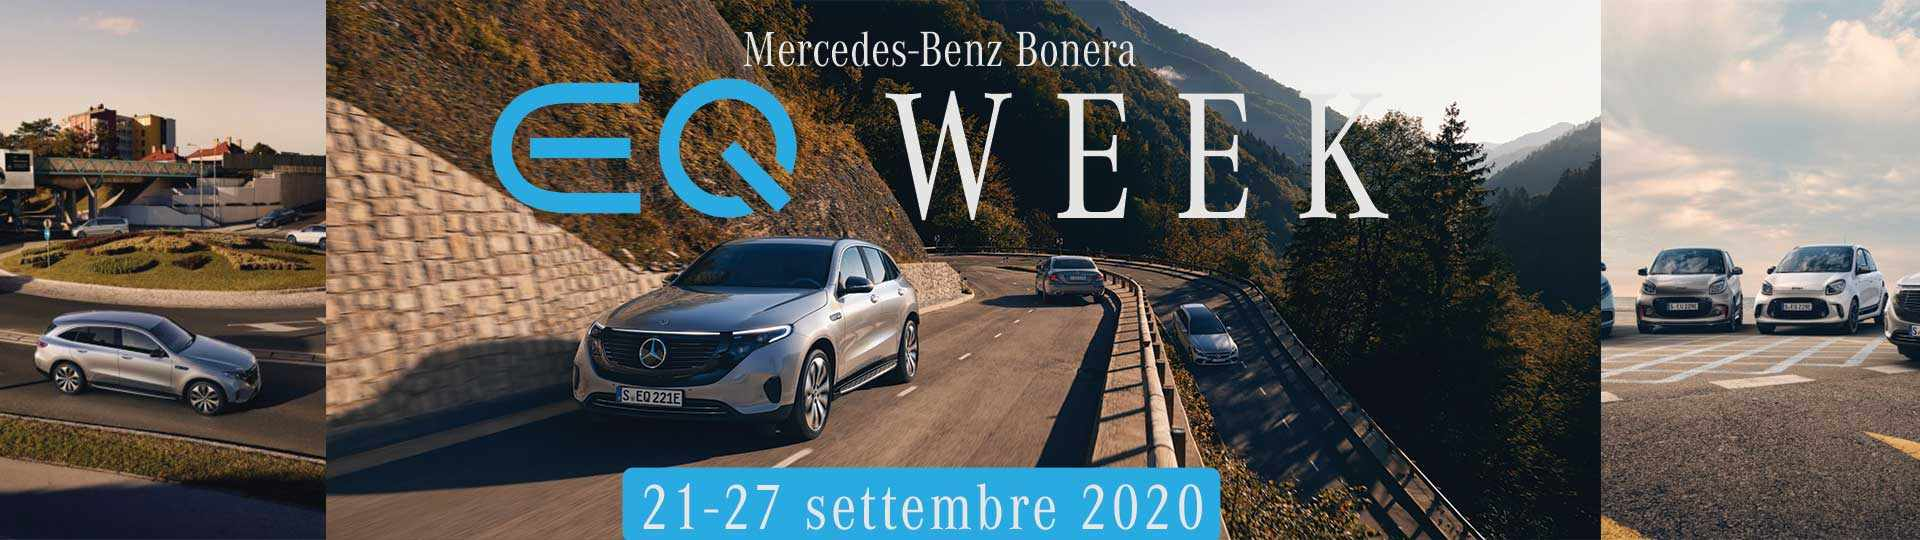 header_eq_week_settembre_2020.jpg